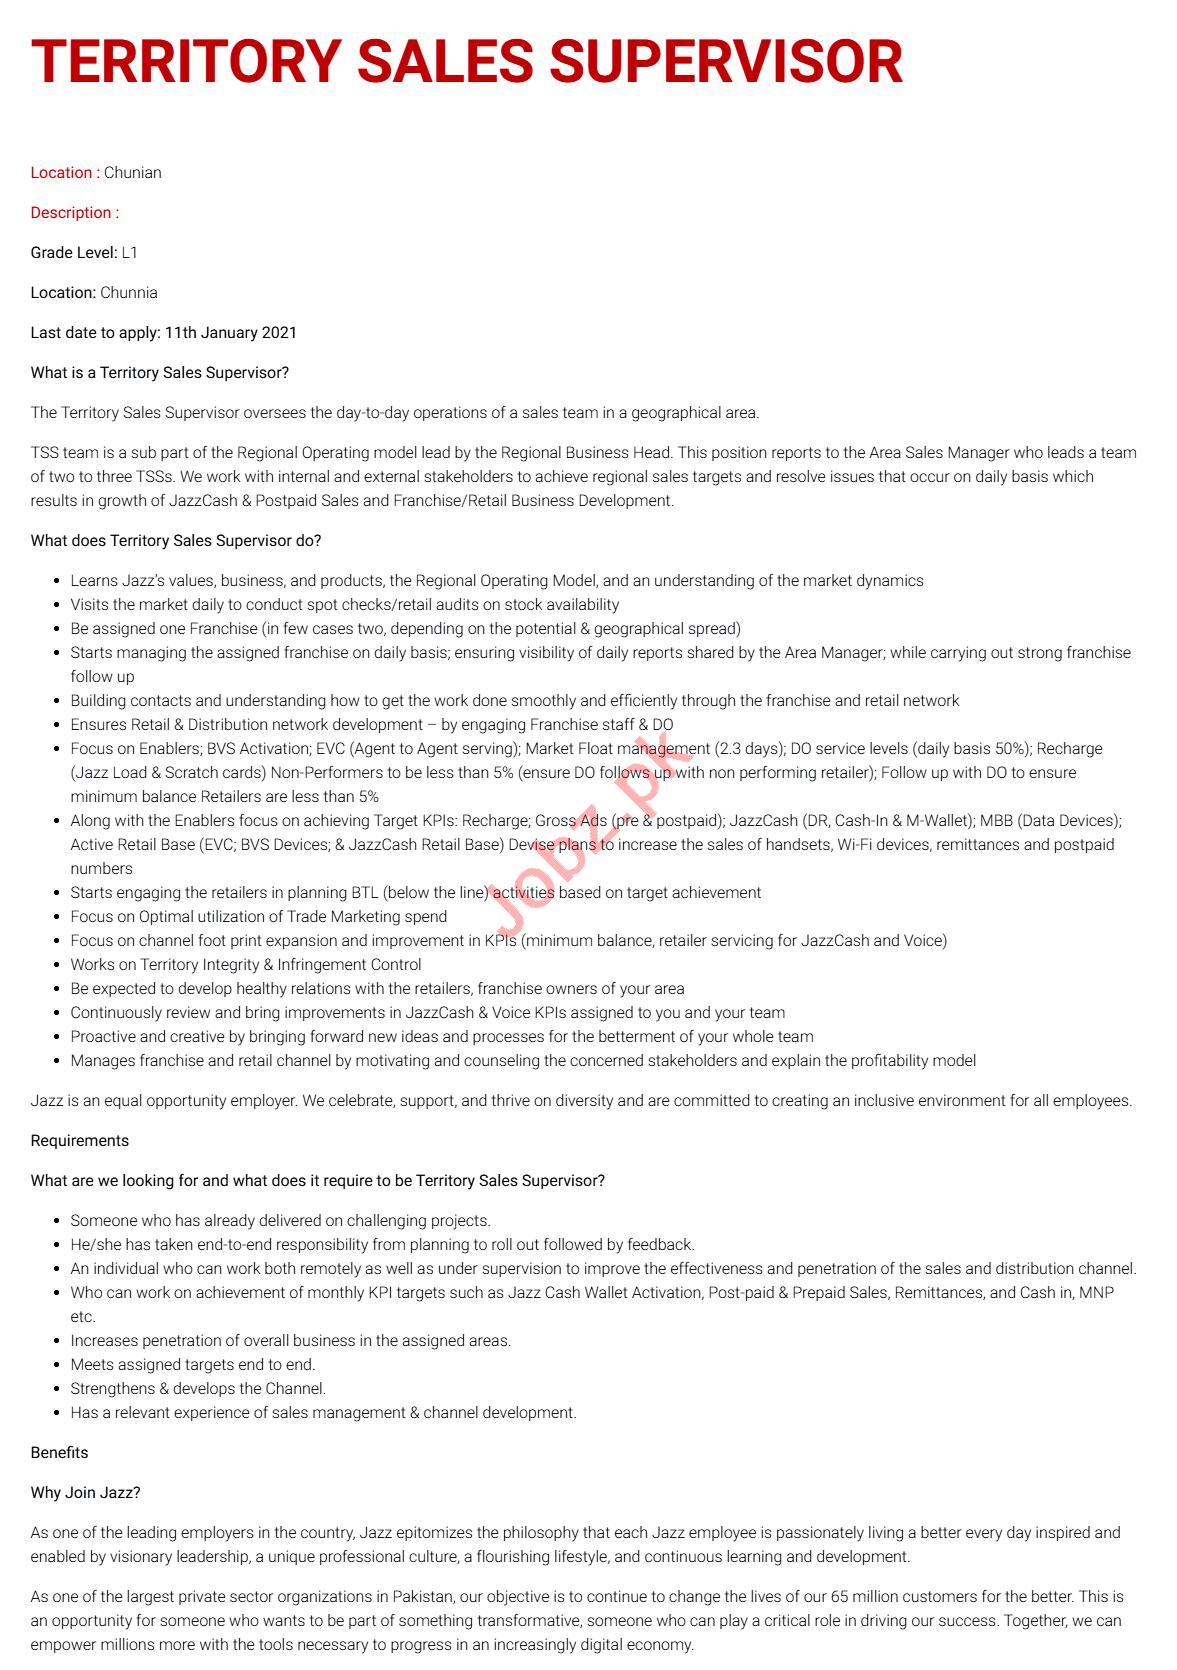 Territory Sales Supervisor & Sales Supervisor Jobs 2021